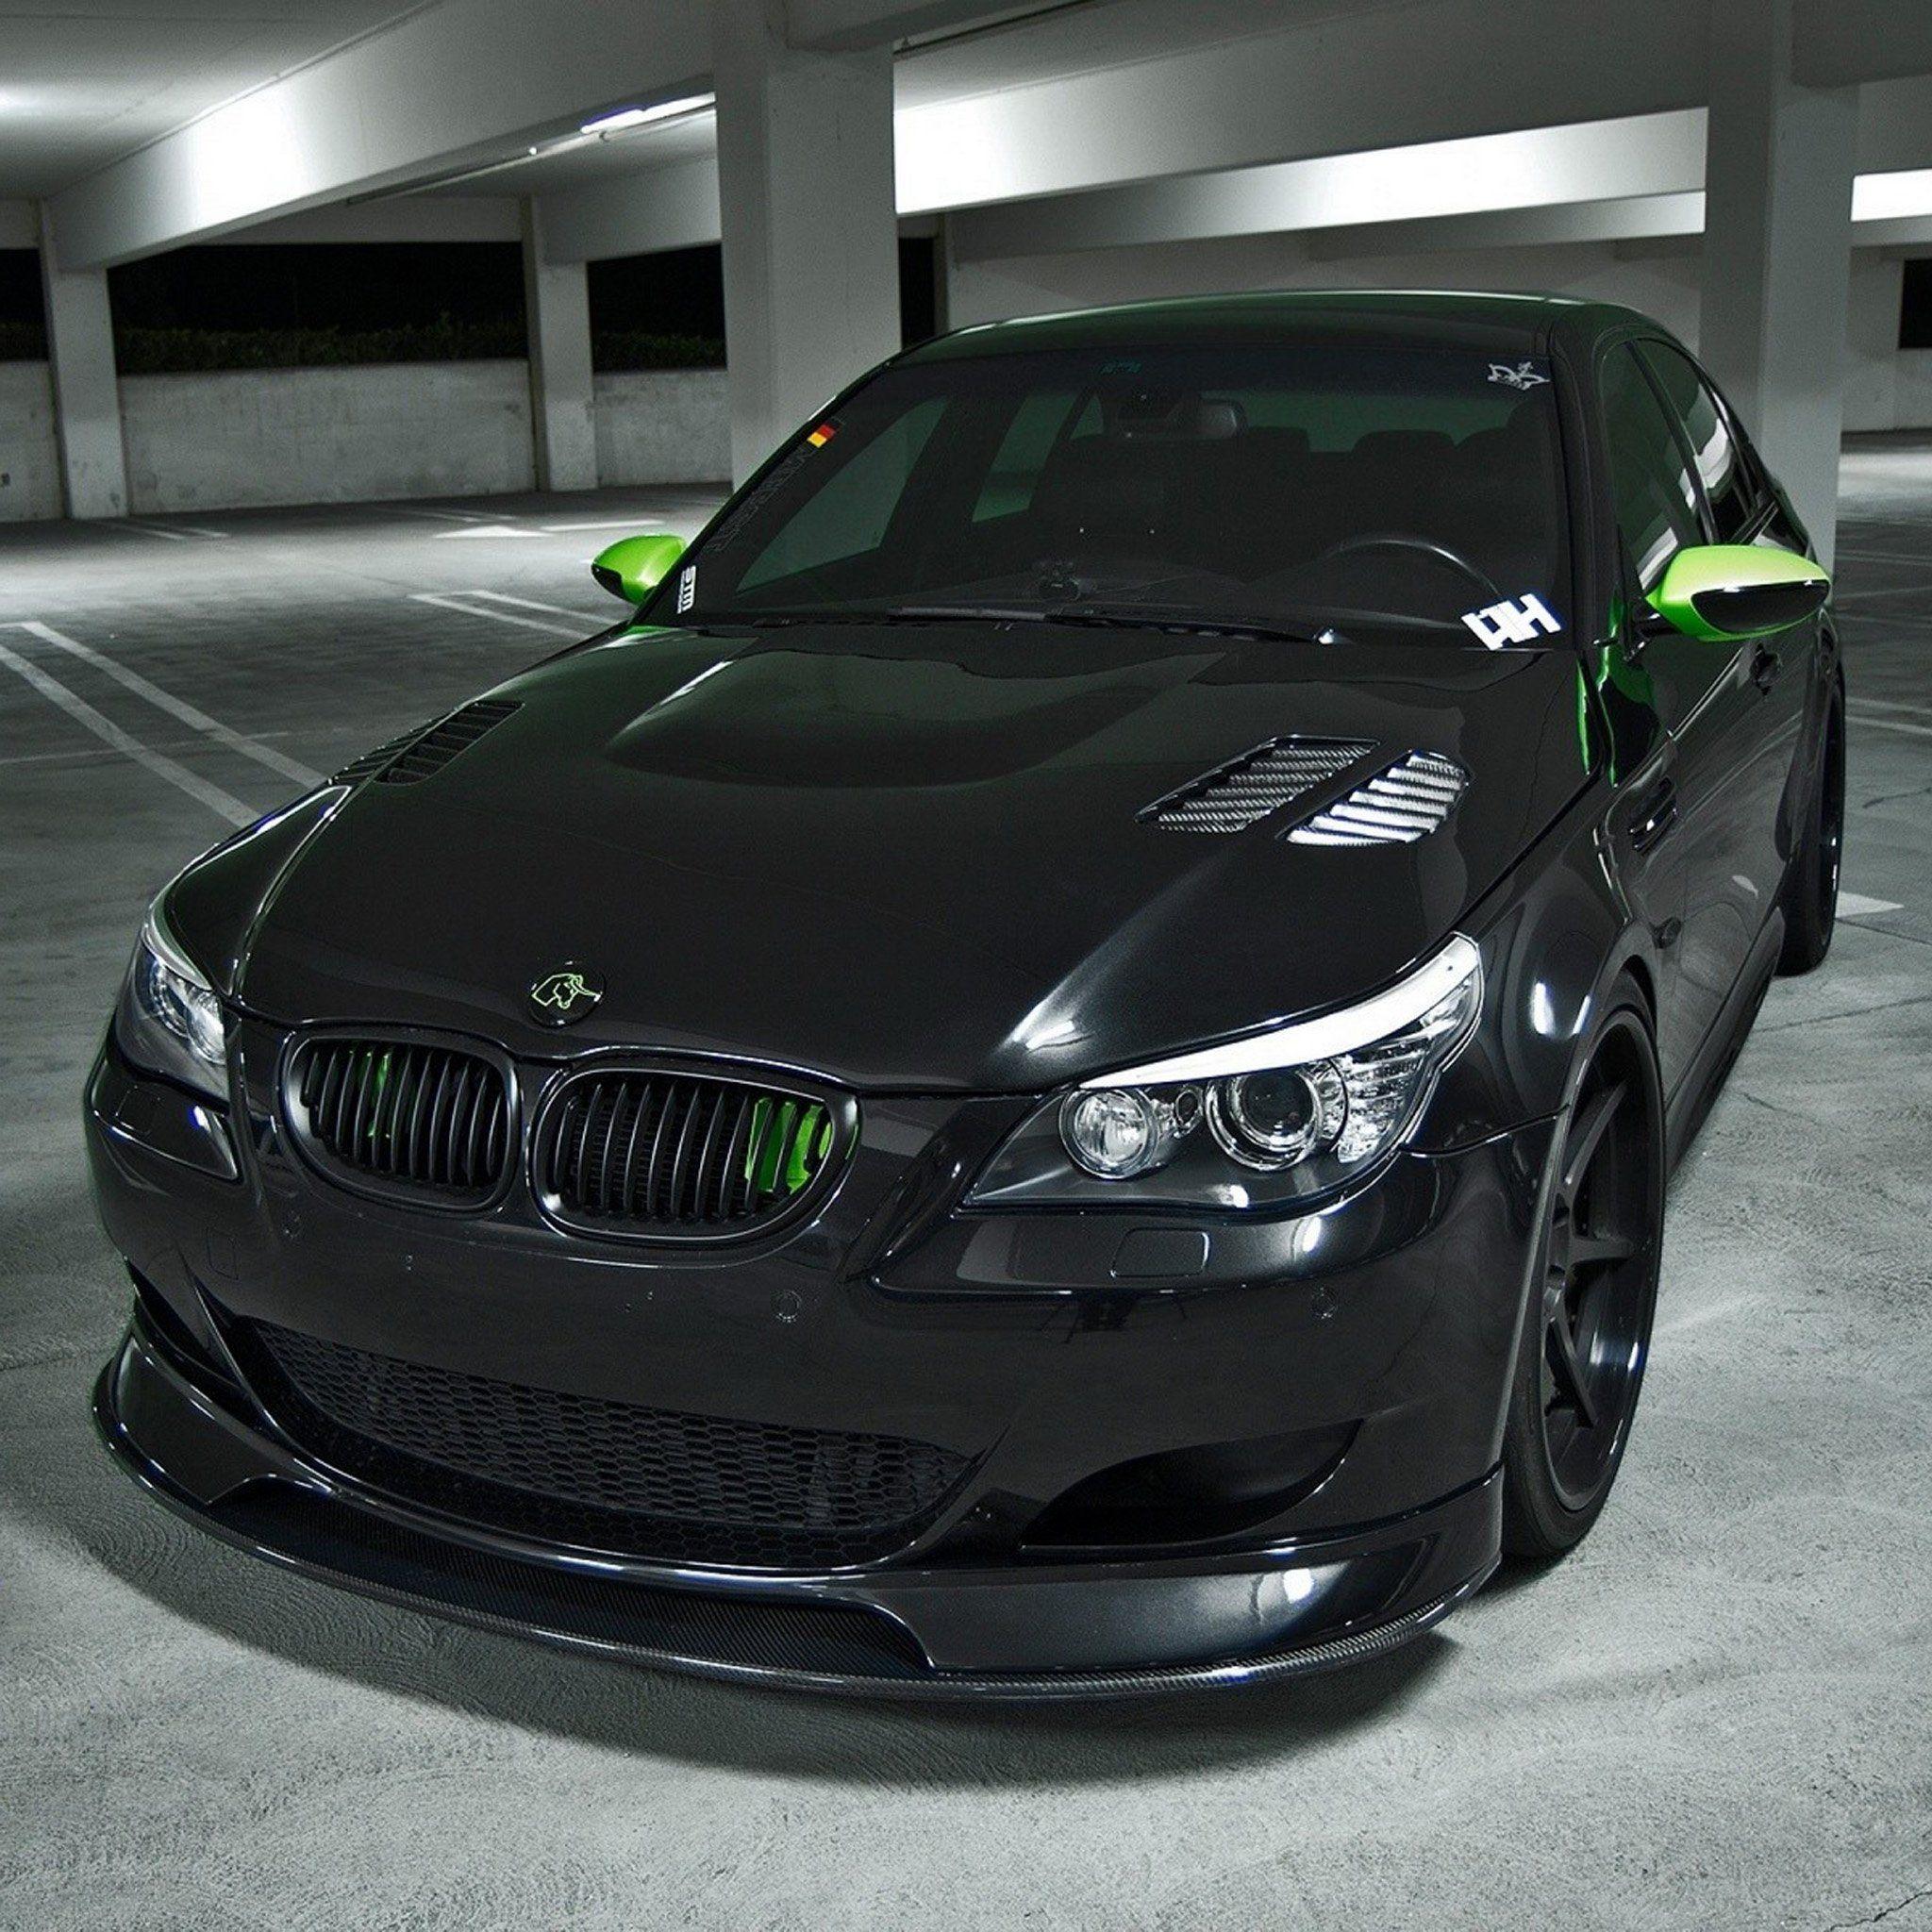 Bmw M5 Sport: BMW M5 Pinterest - Sexy Sport Cars